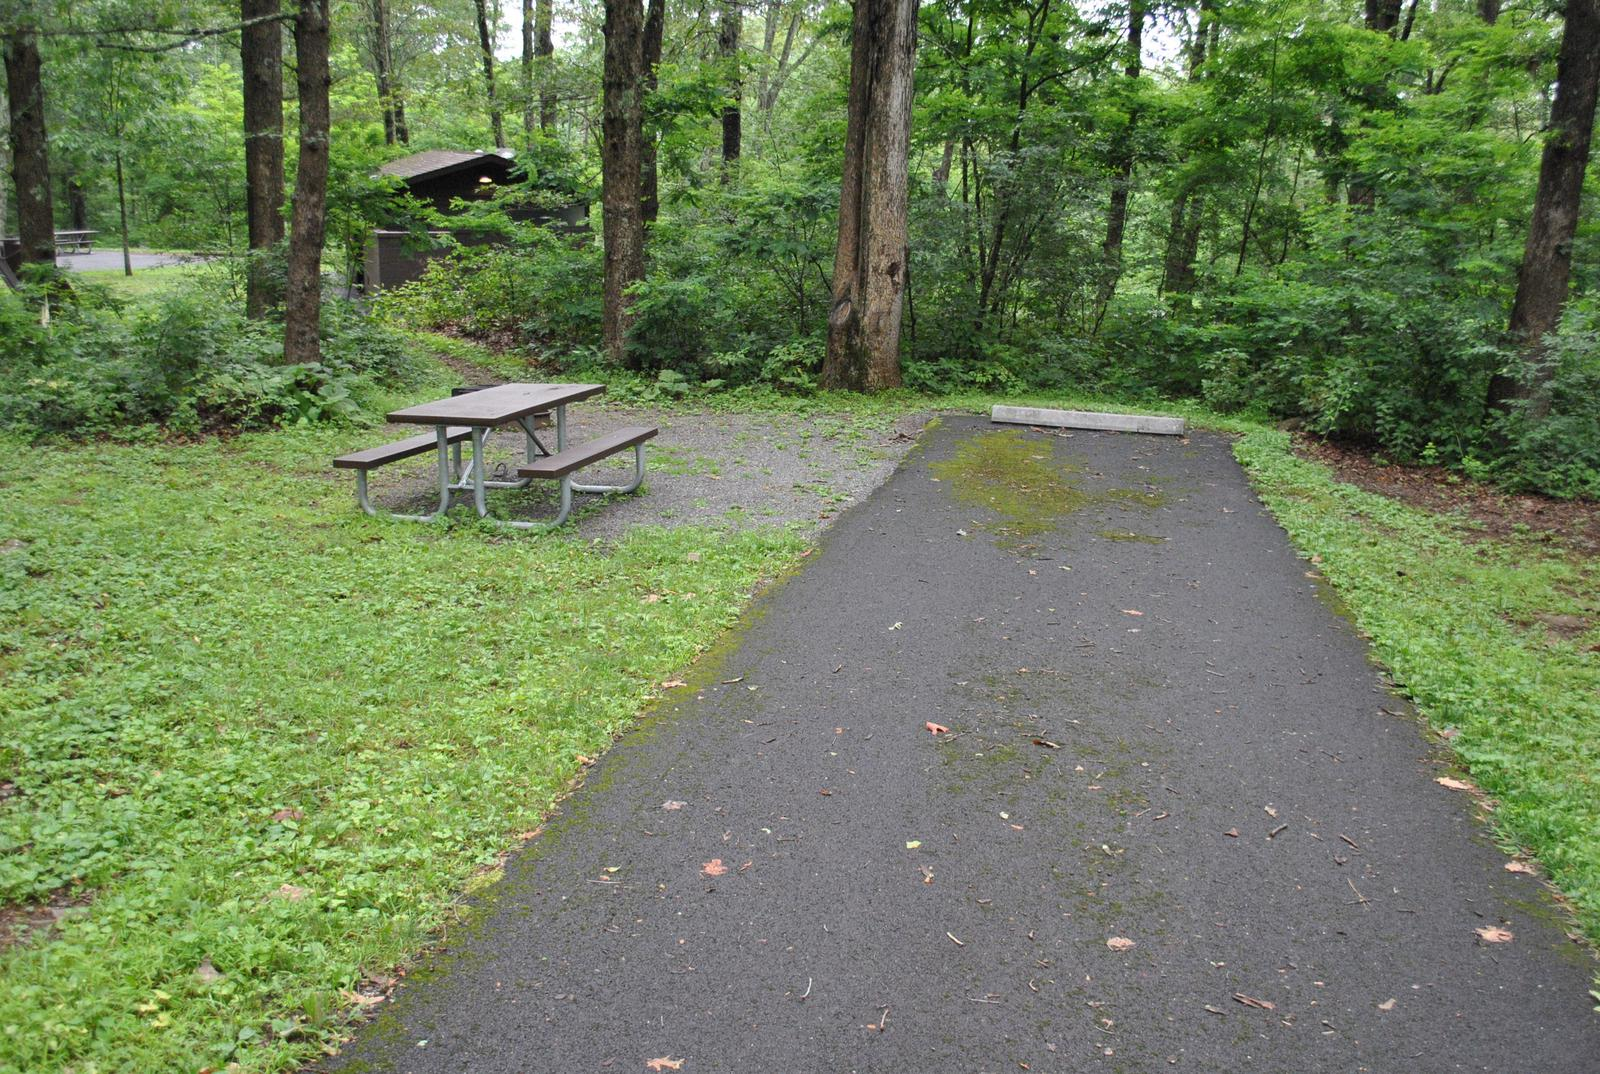 Mathews Arm Campground - Site B129